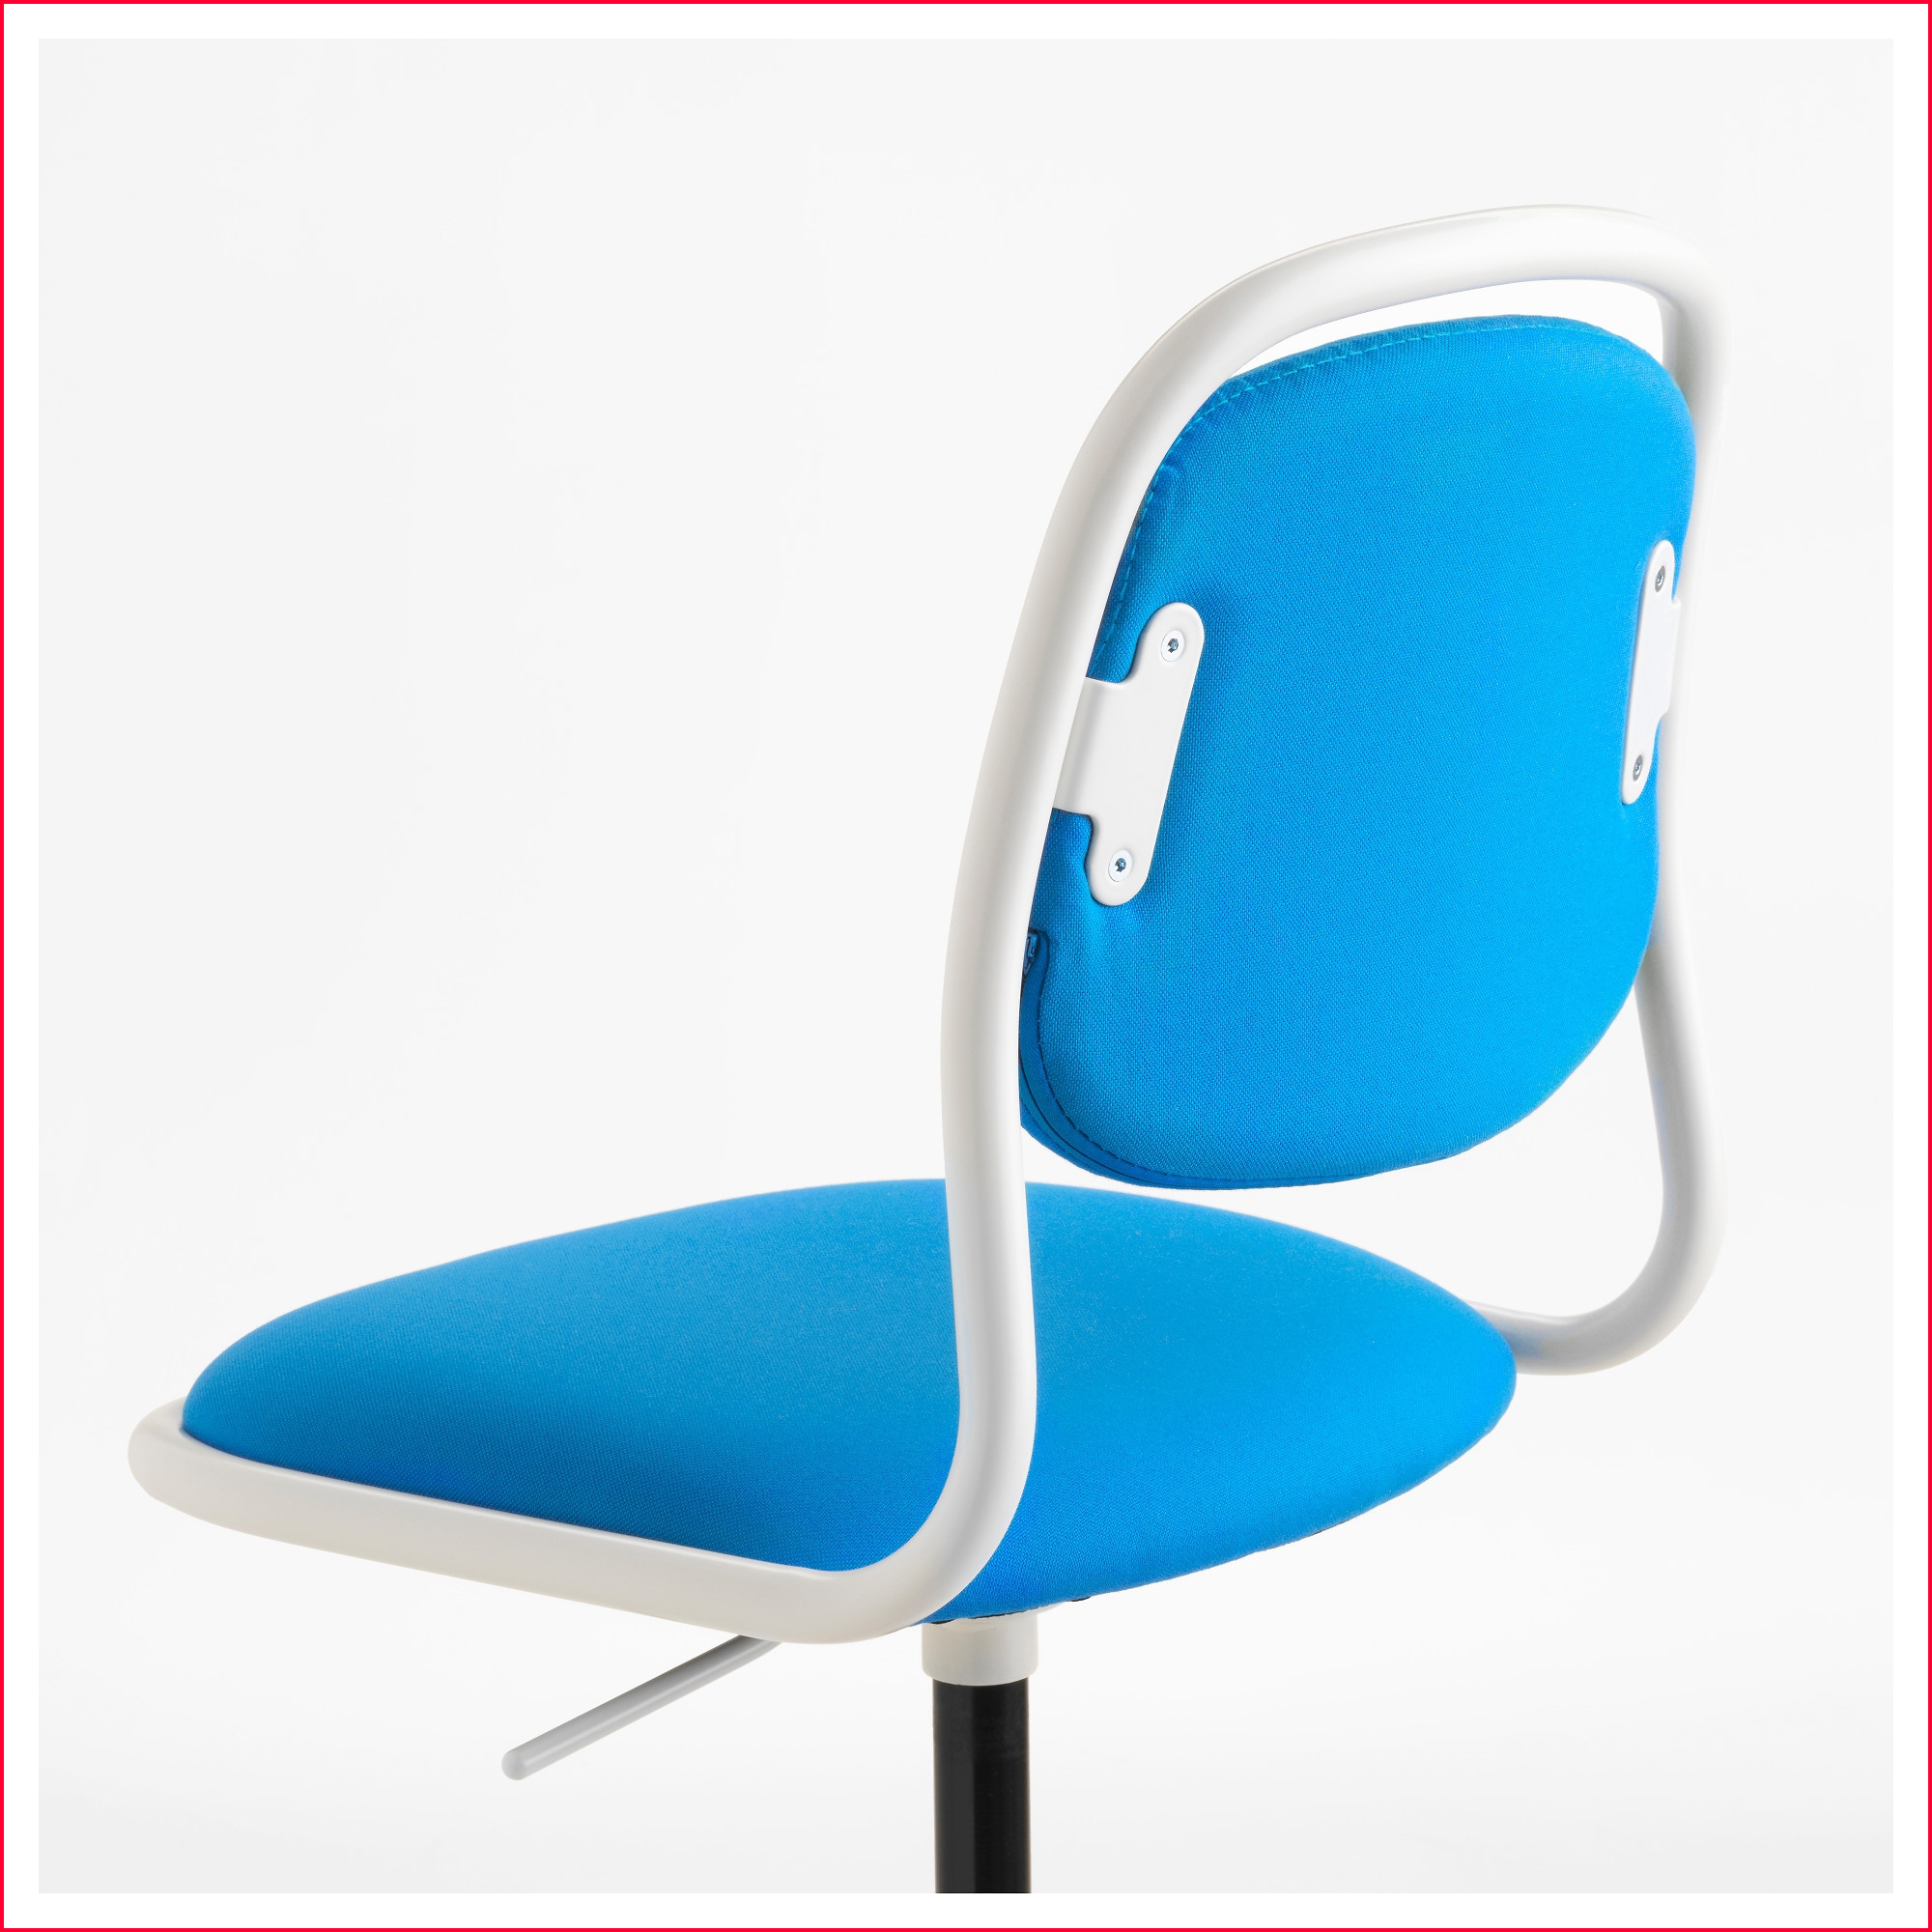 Ikea Sillas Niños Zwd9 Silla Nià O Rfj Ll Silla Escritorio NiO Blanco Vissle Azul